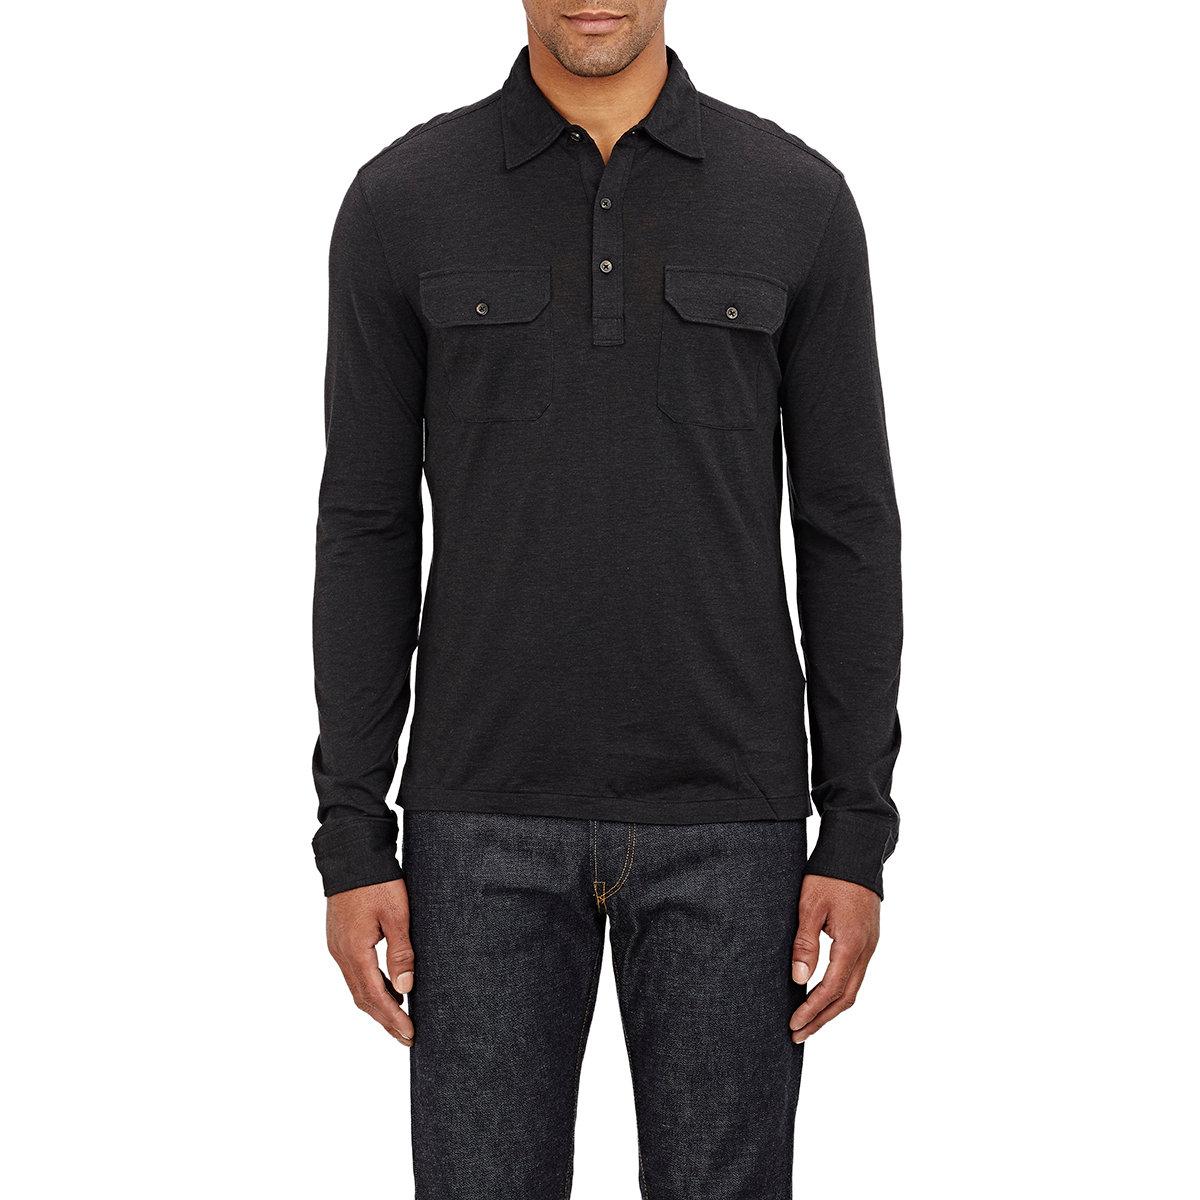 Ralph lauren black label jersey polo shirt in gray for men for Ralph lauren black label polo shirt